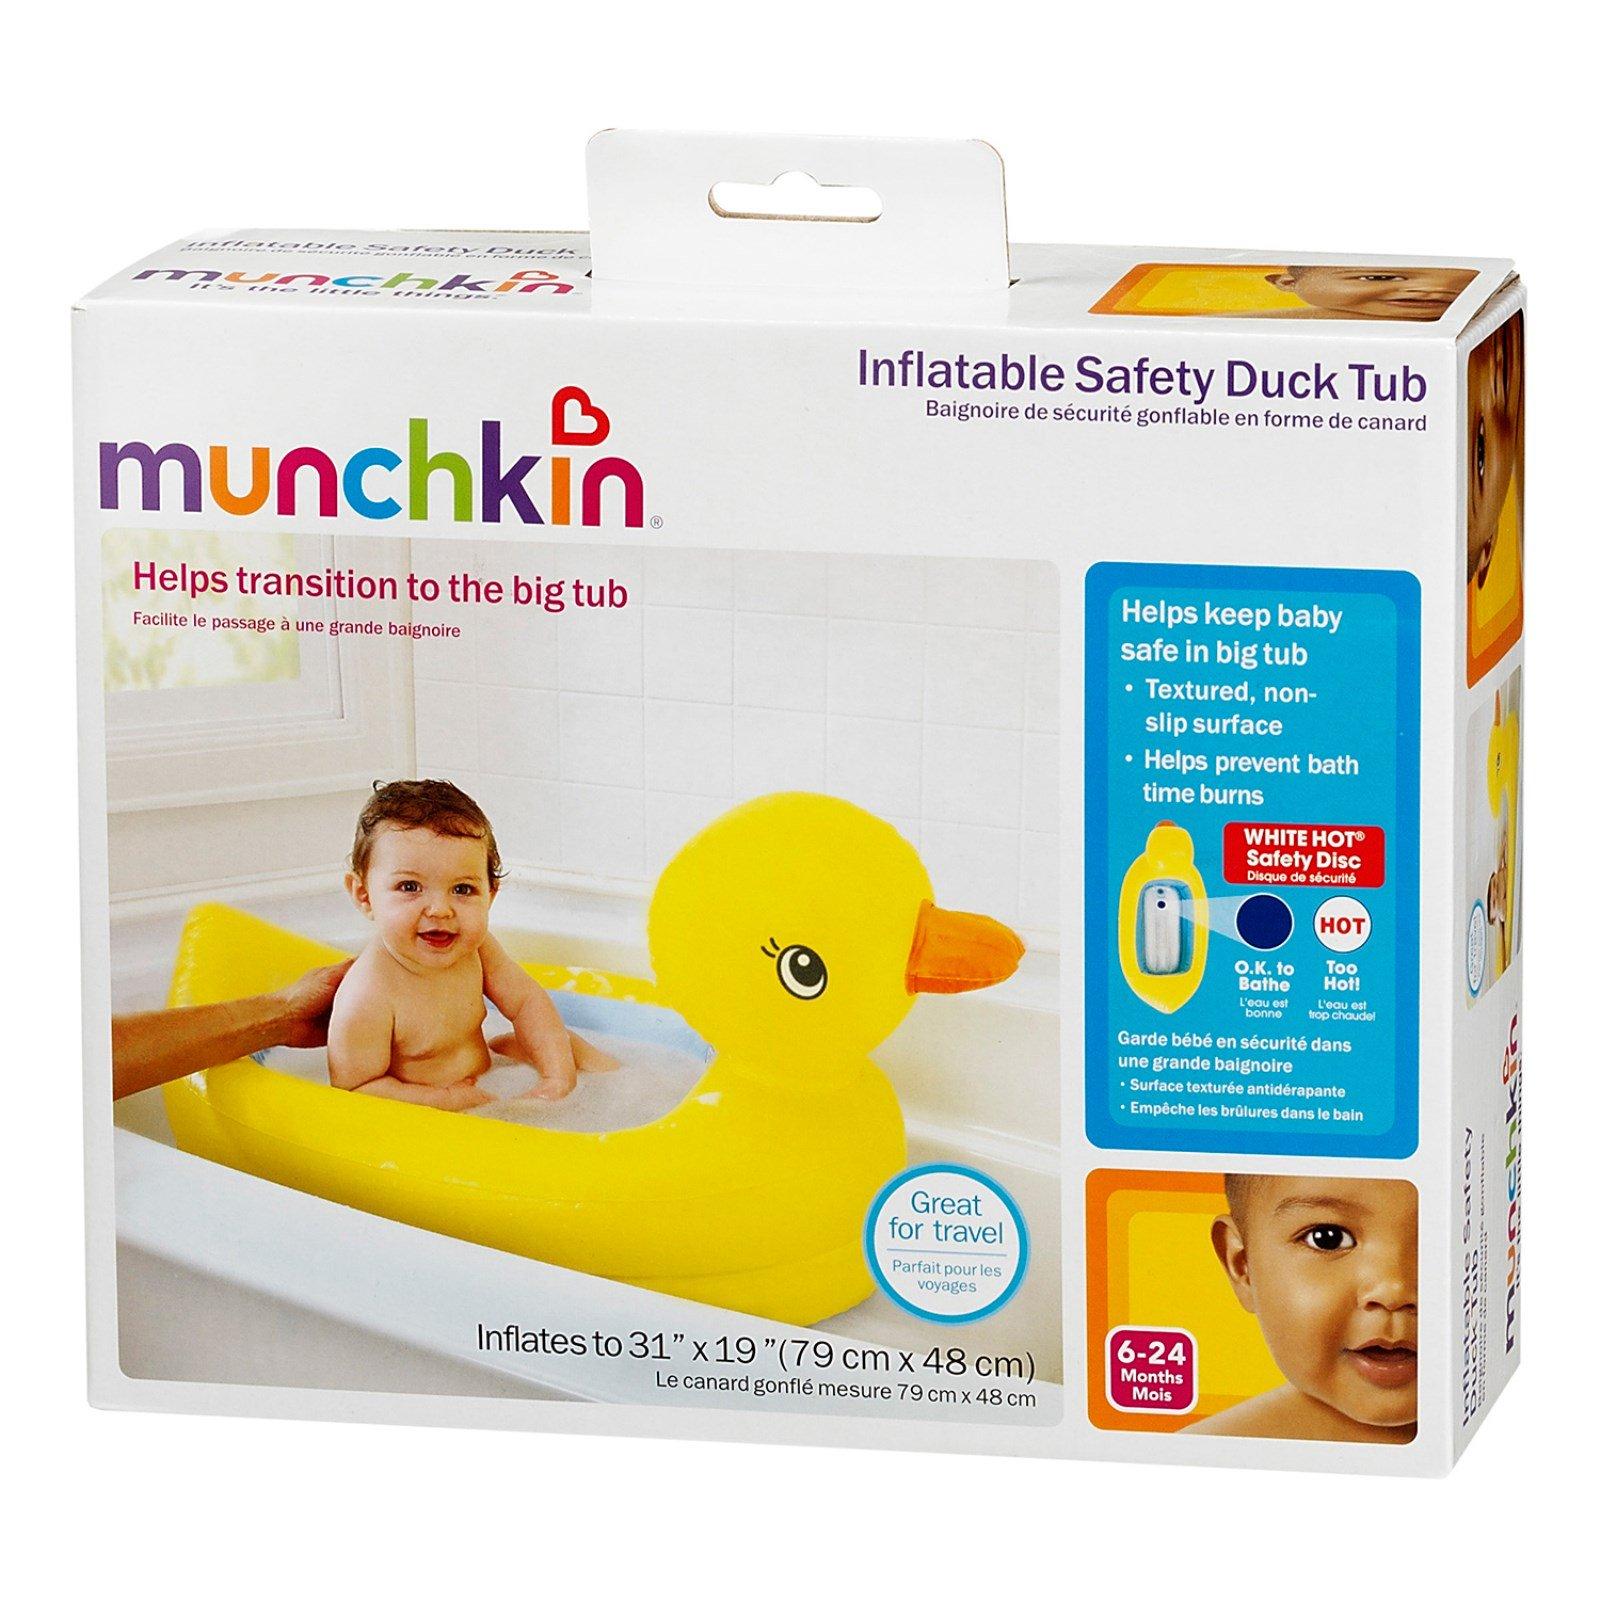 Munchkin, Inflatable Safety Duck Tub, 1 Tub - iHerb.com